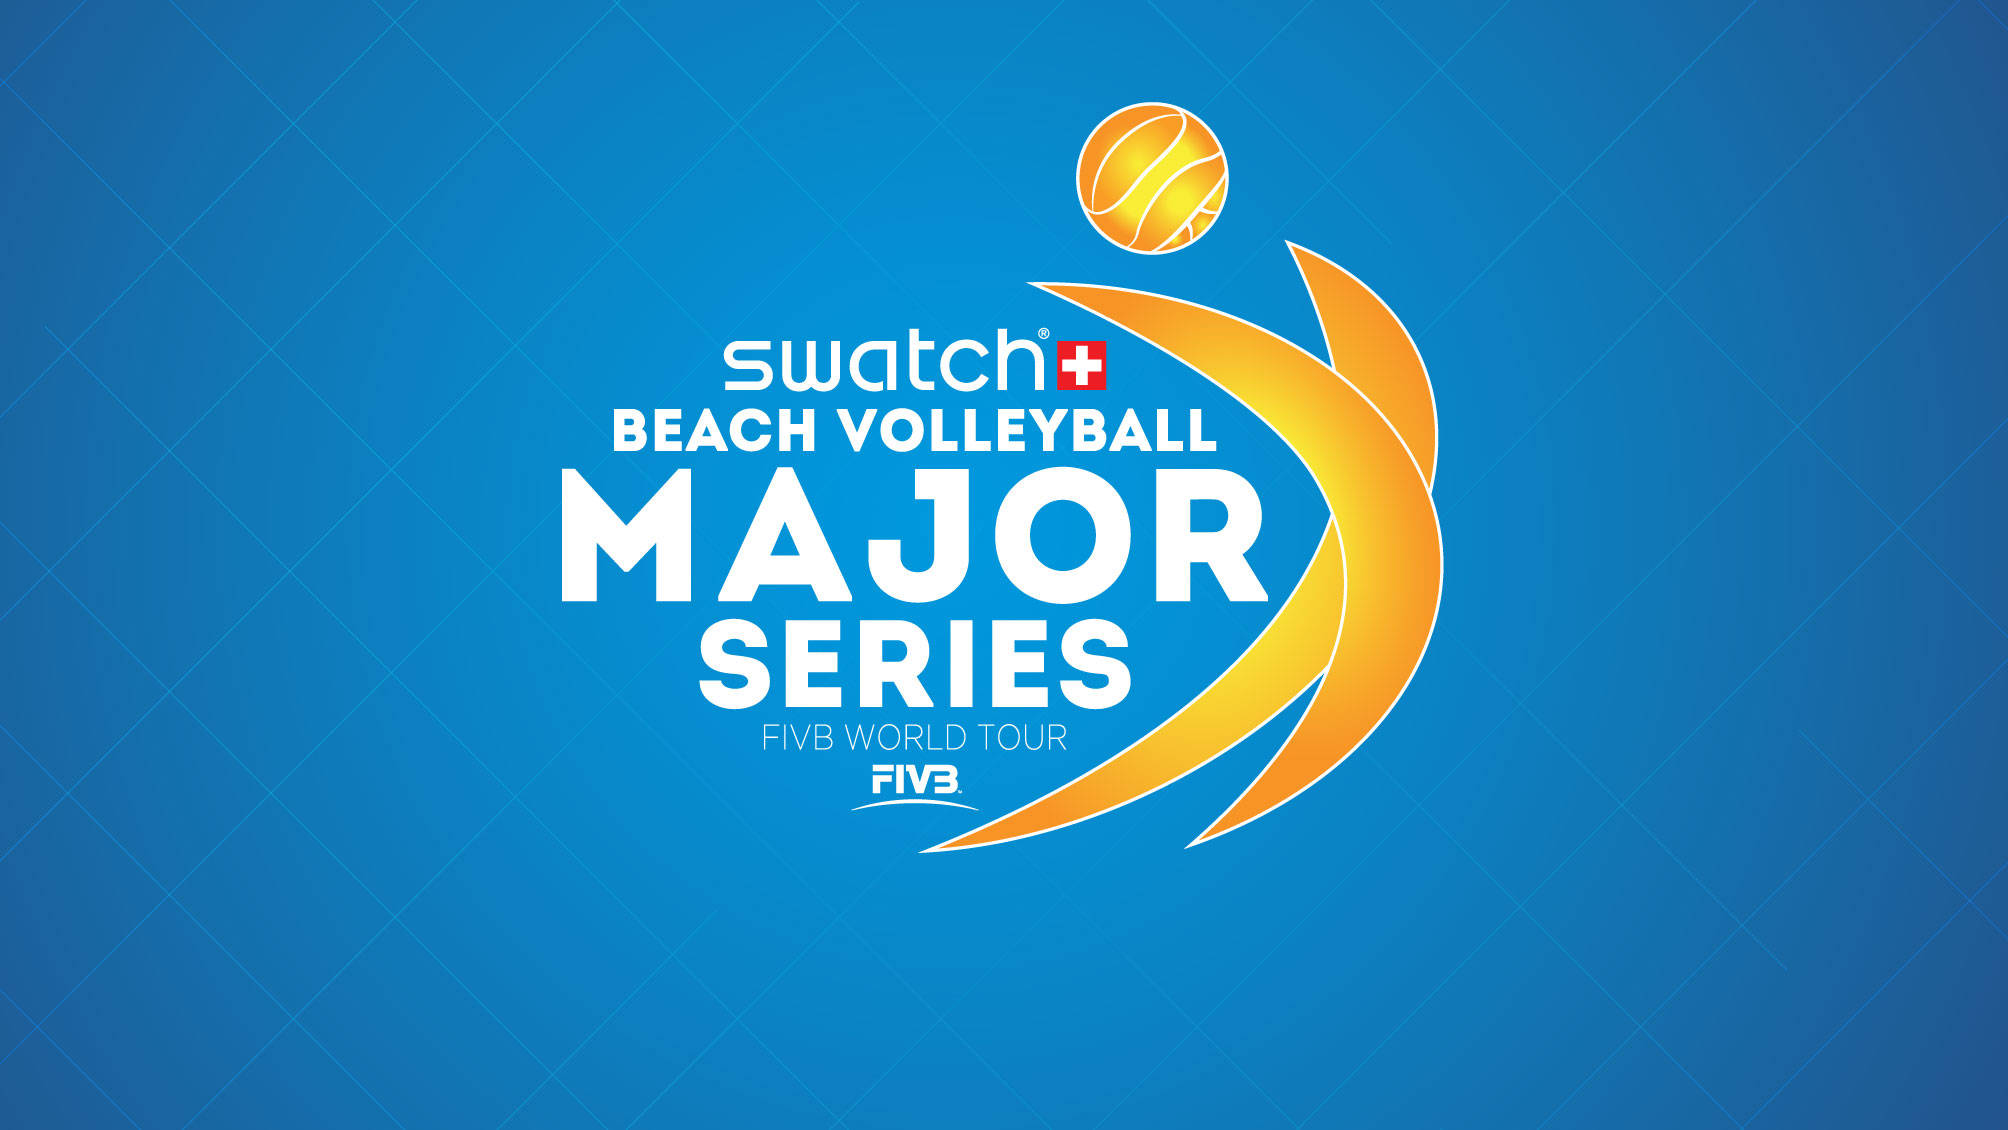 Swatch beach volleyball Major Series 2016